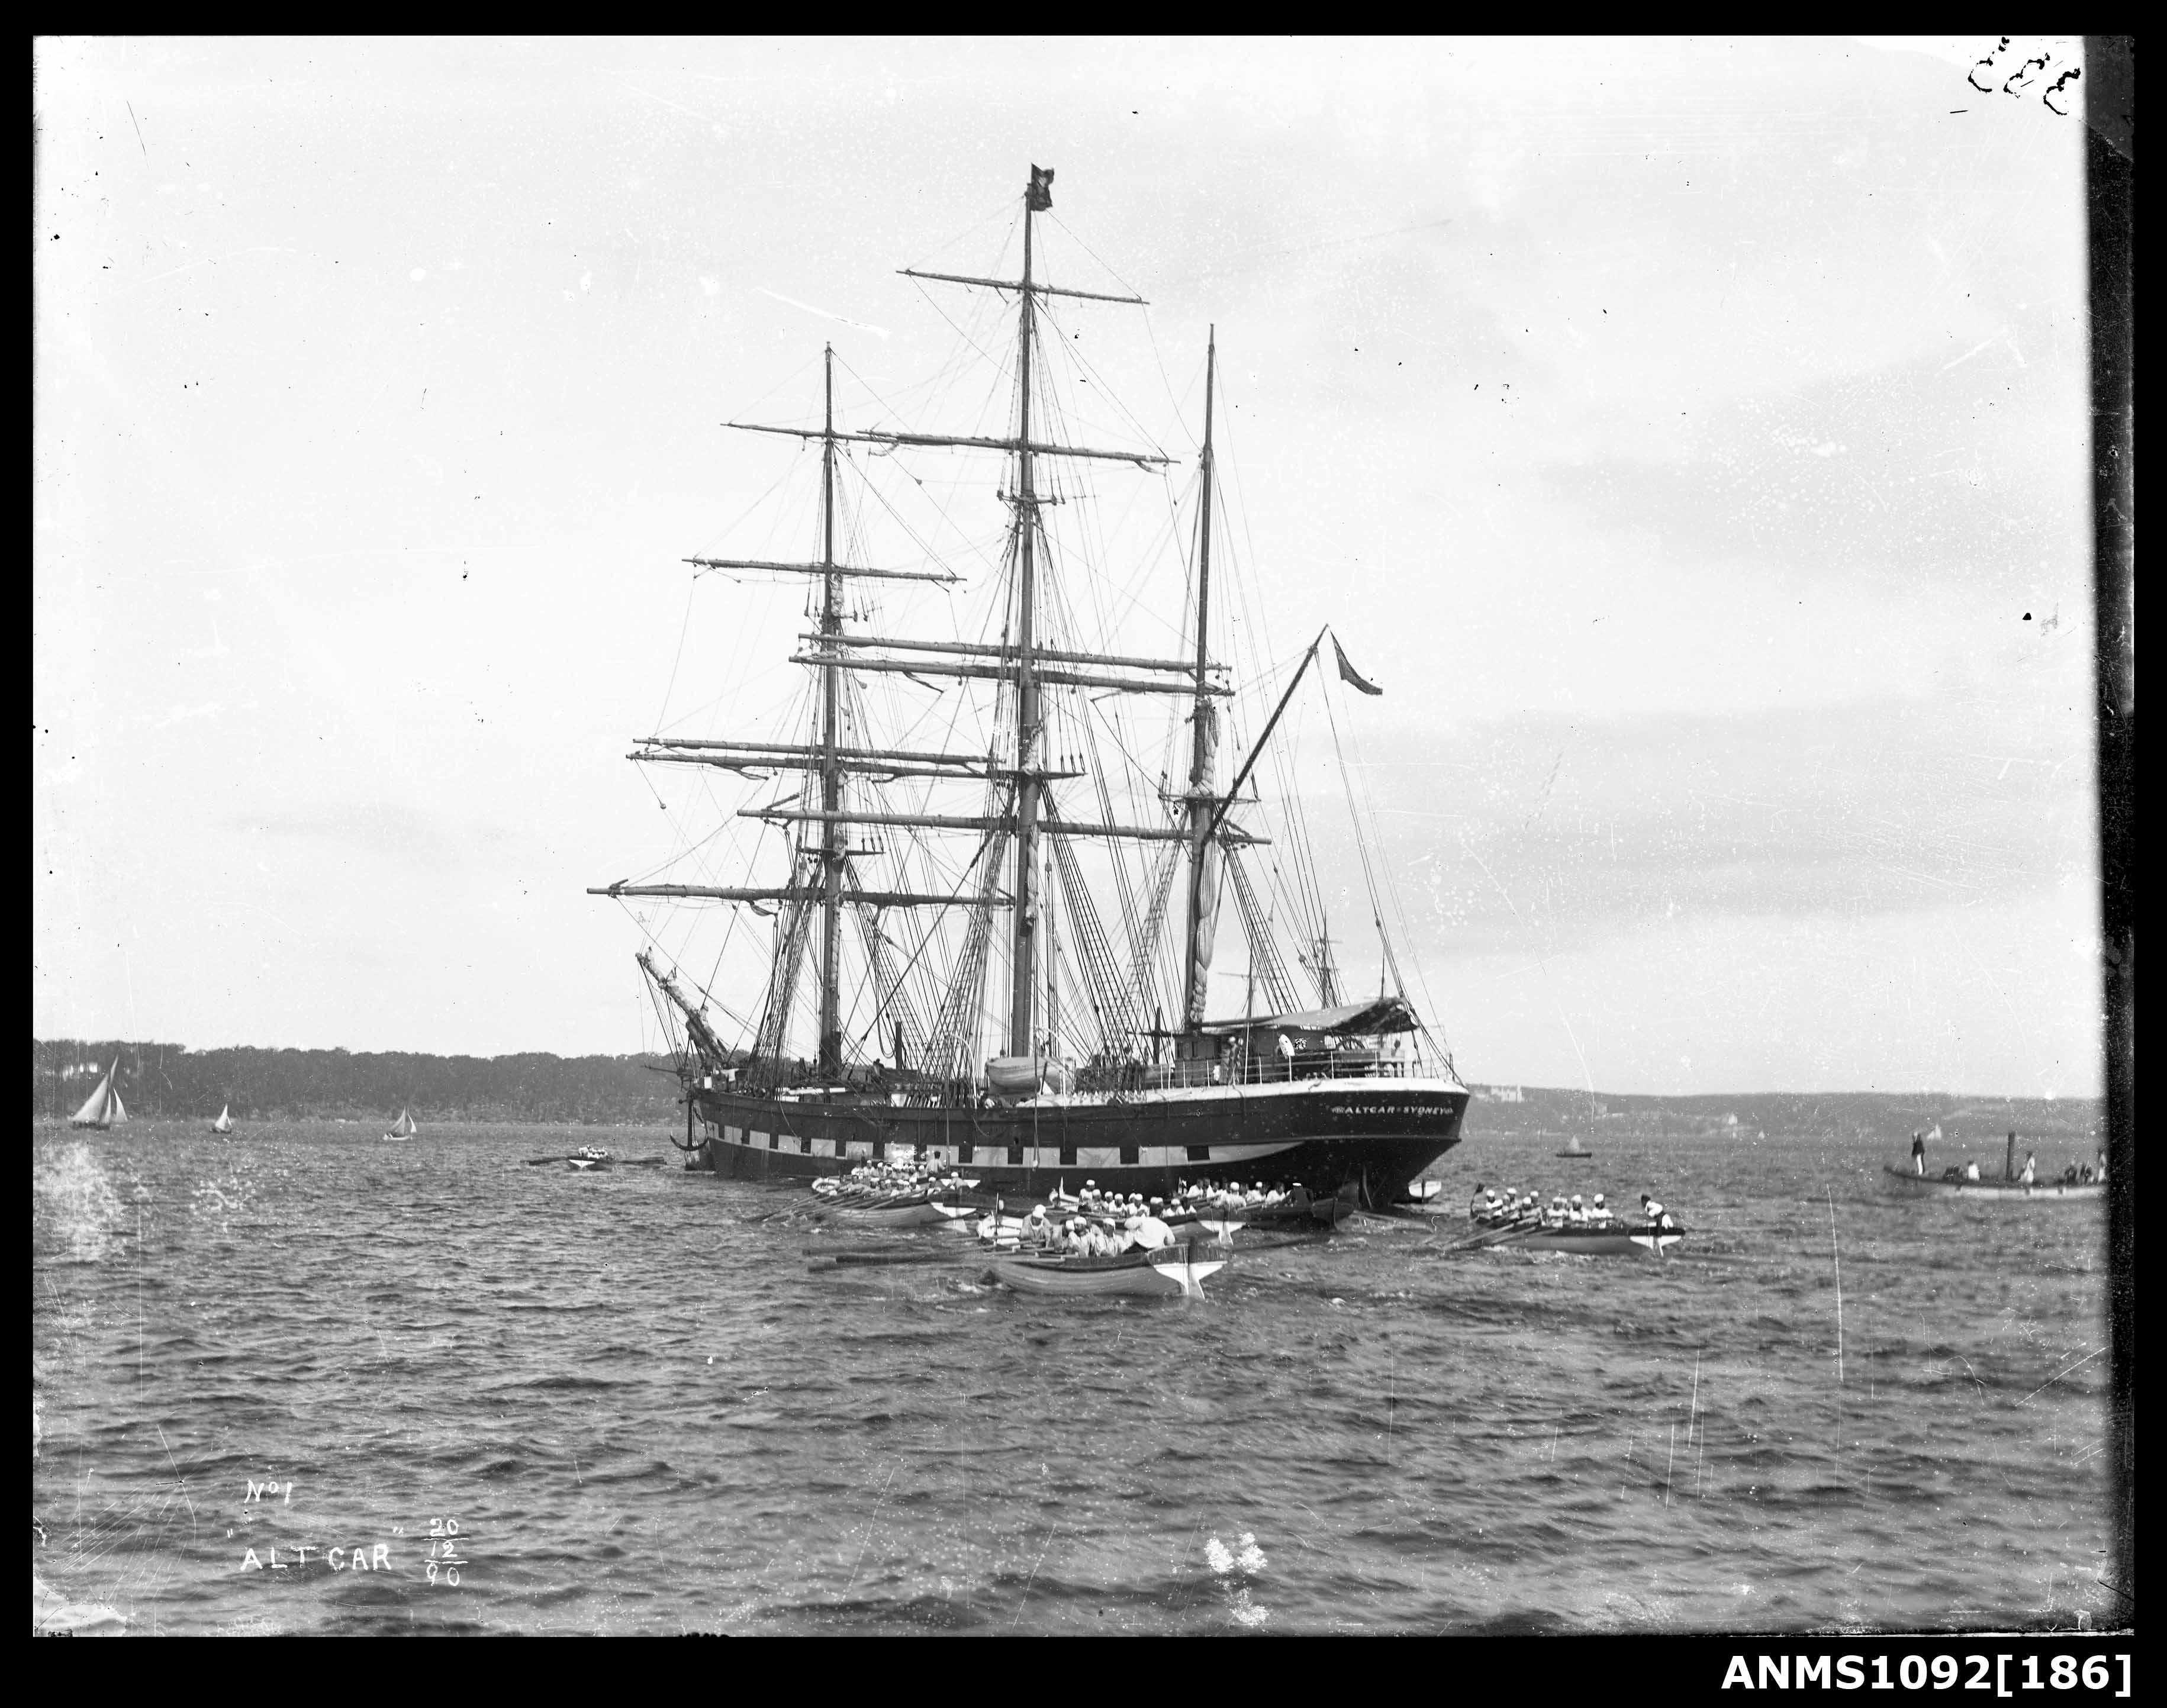 Three masted barque ALTCAR at anchor, Sydney Harbour